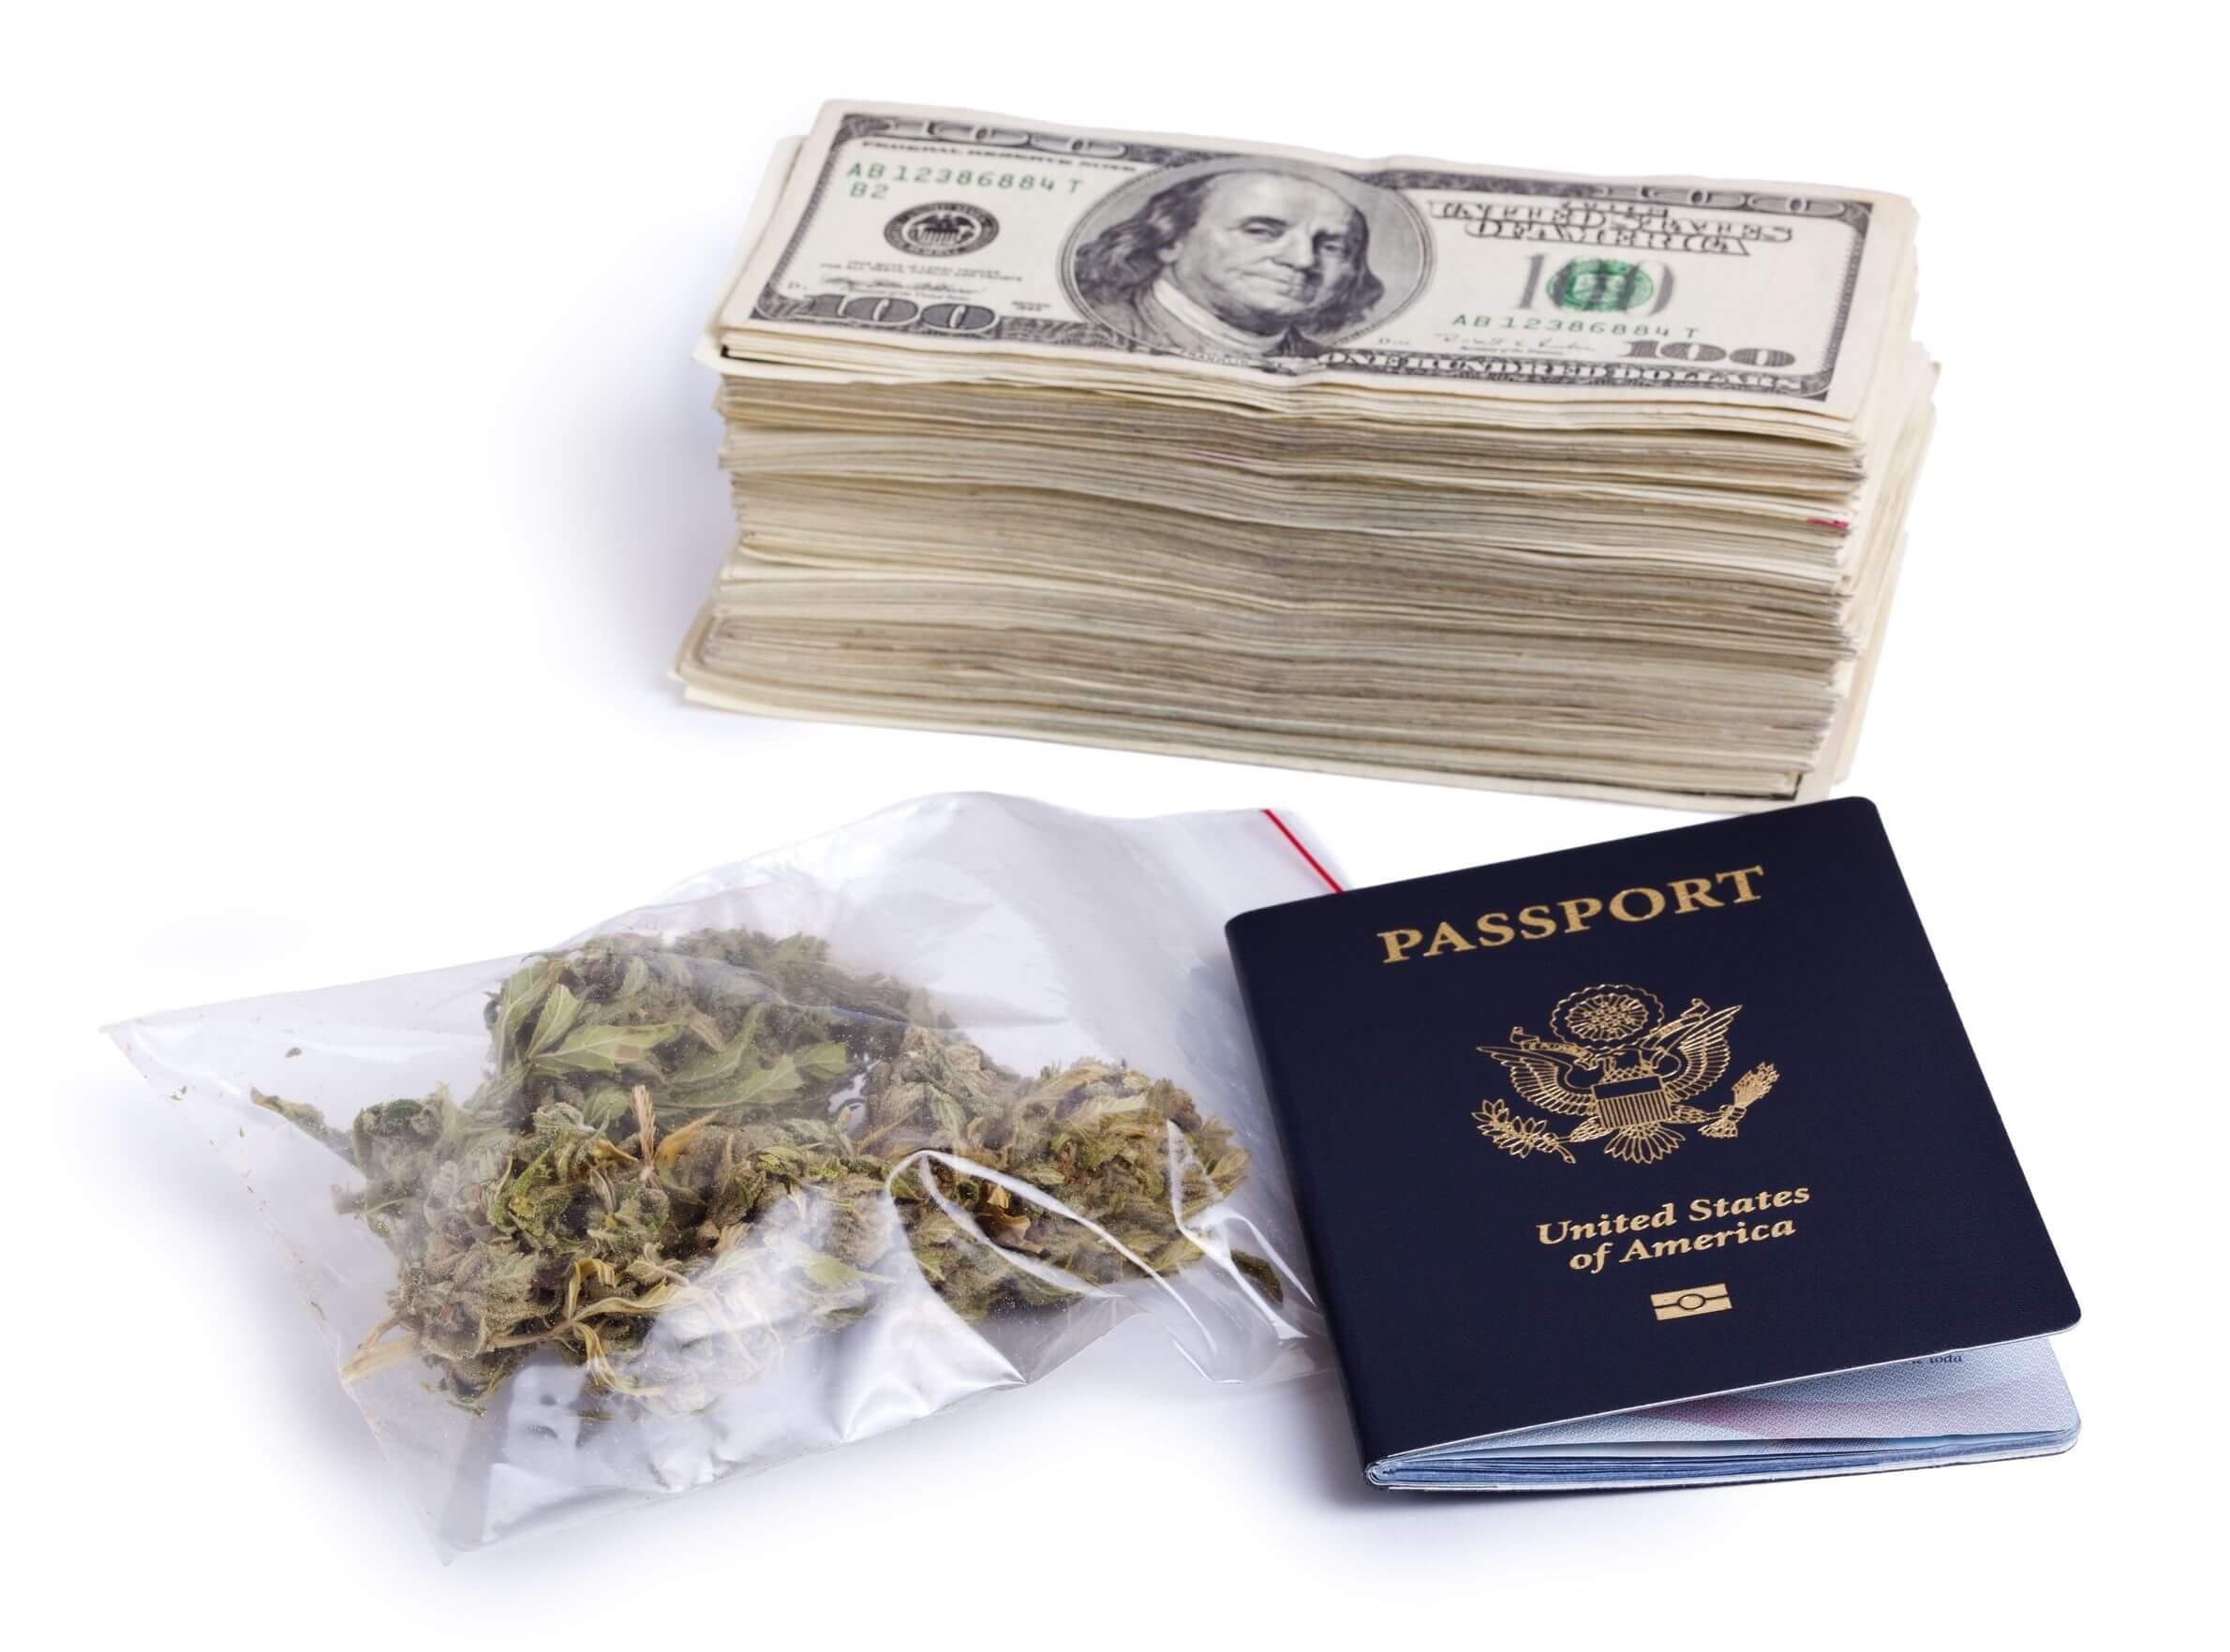 Dallas Pilot Accused of Smuggling $200,000